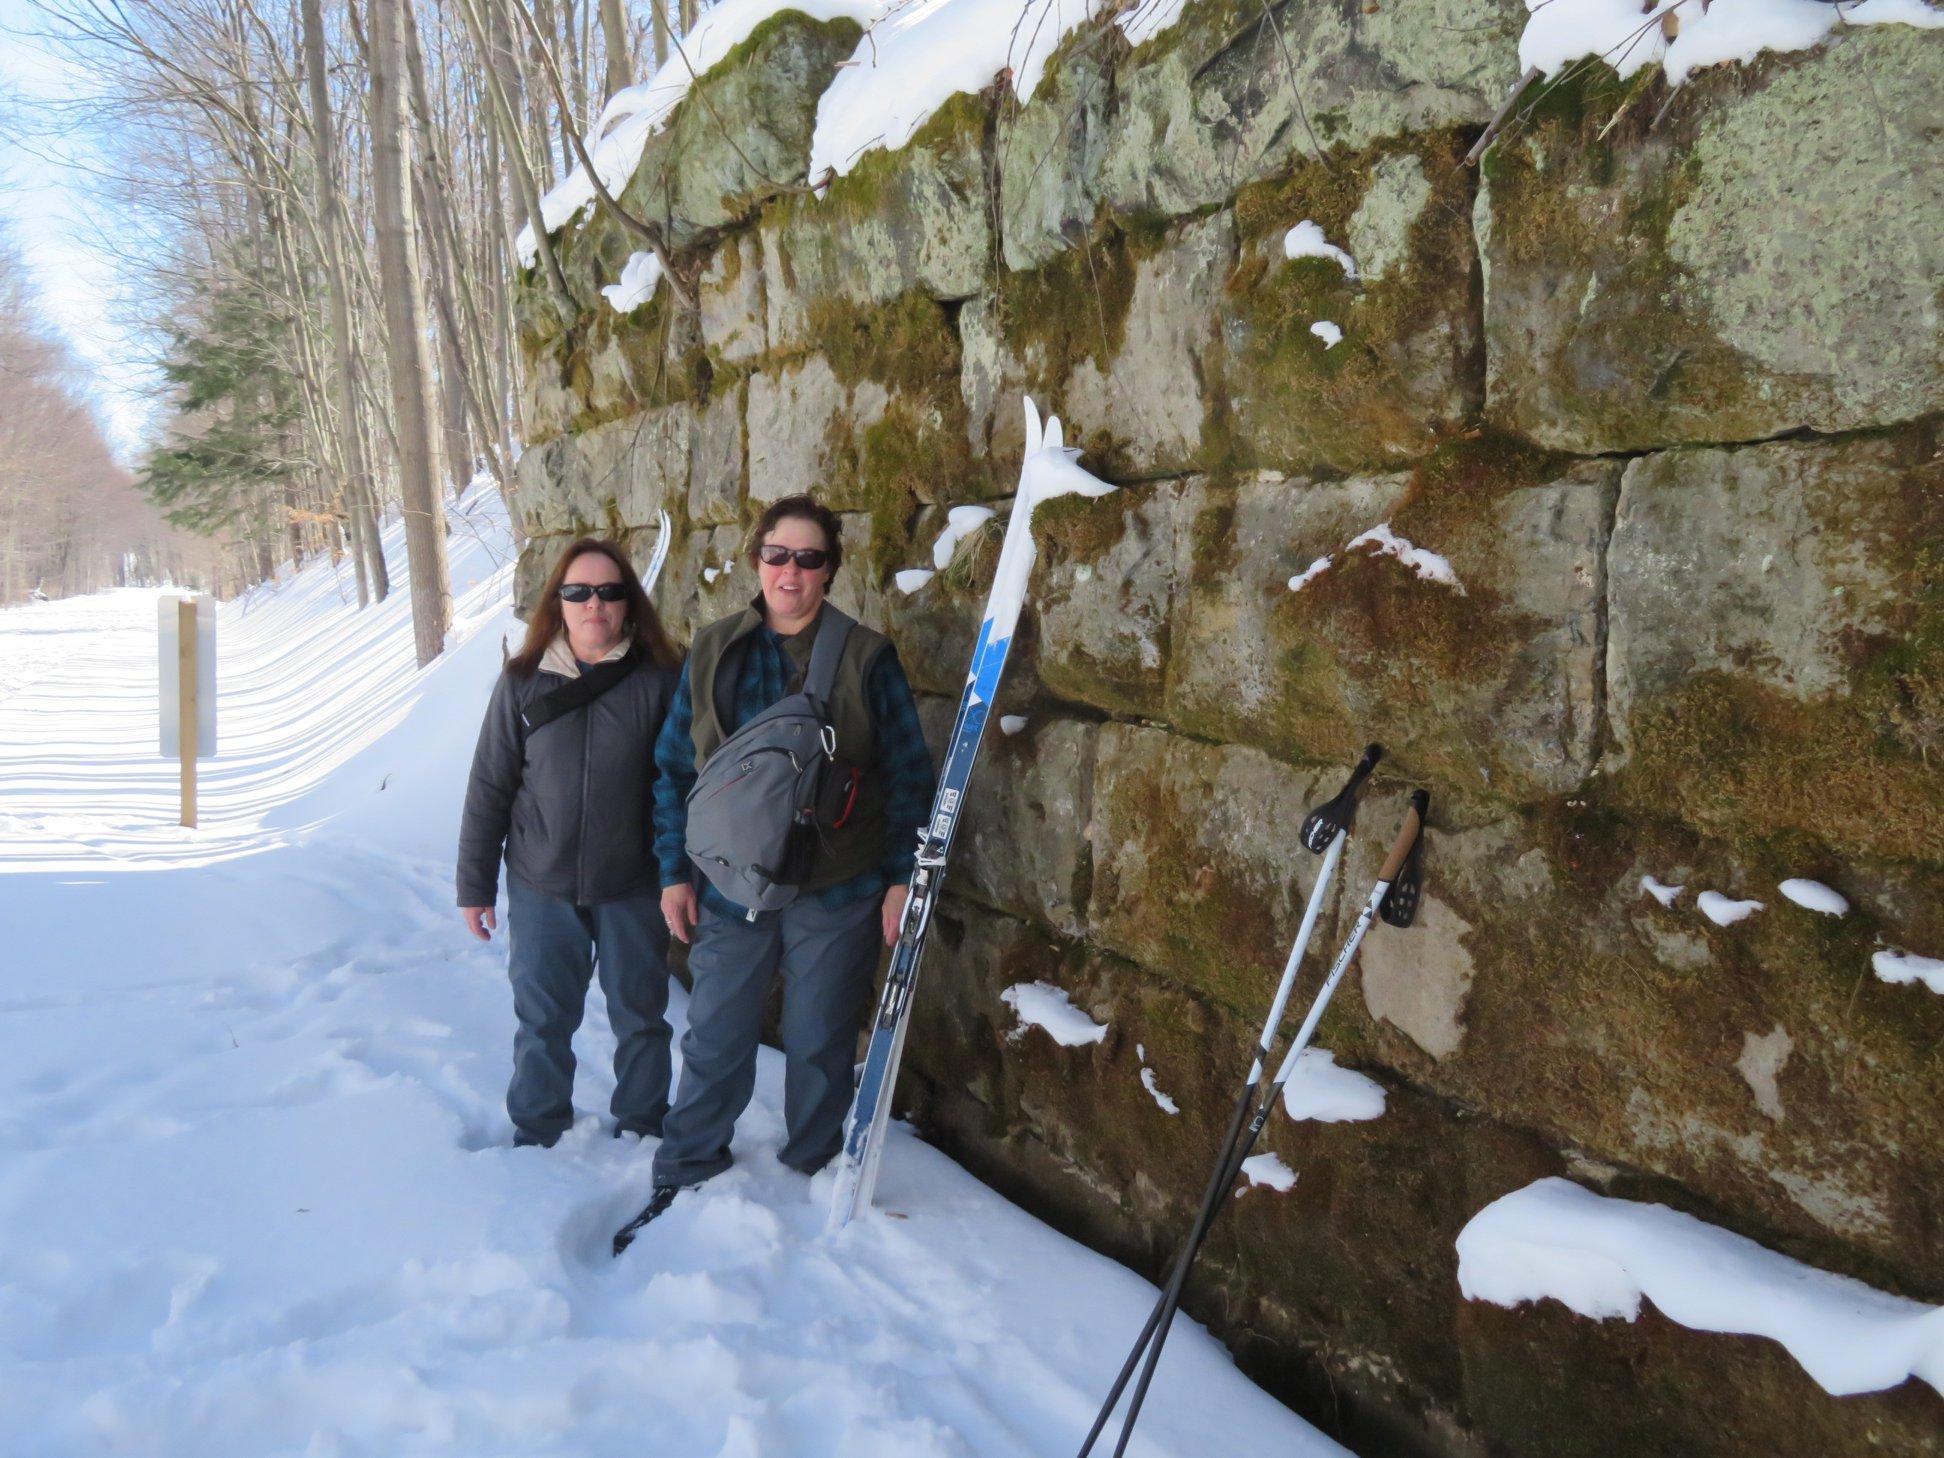 skiiers by the wall.jpg